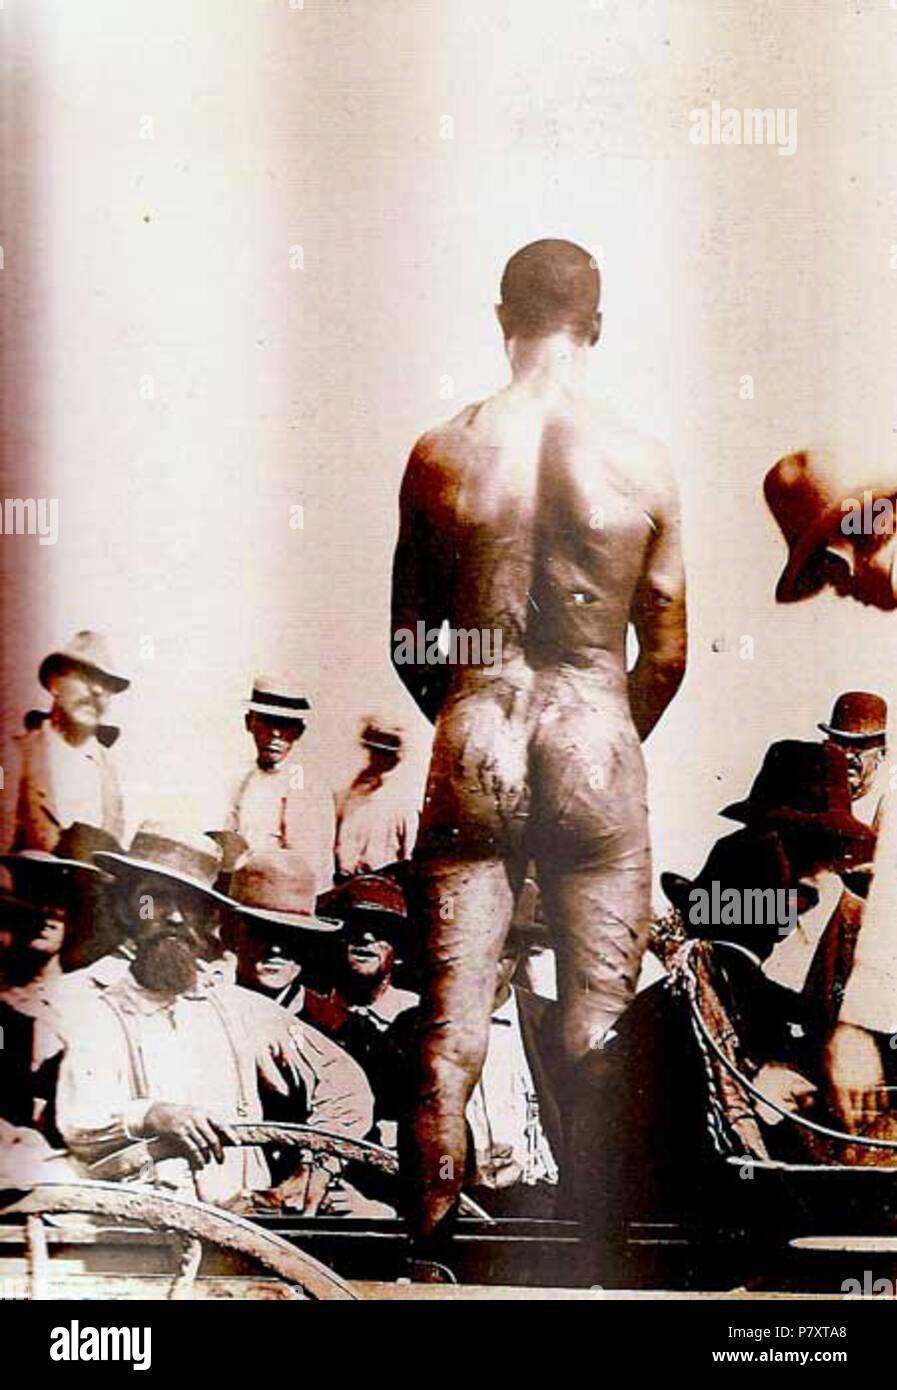 English: Image of the lynching of Frank Embree, Fayette, Missouri 1899 Deutsch: Bild des Lynchmordes an Frank Embree, Fayette, Missouri 1899 . 22 July 1899 162 Frank Embree 2 - Stock Image